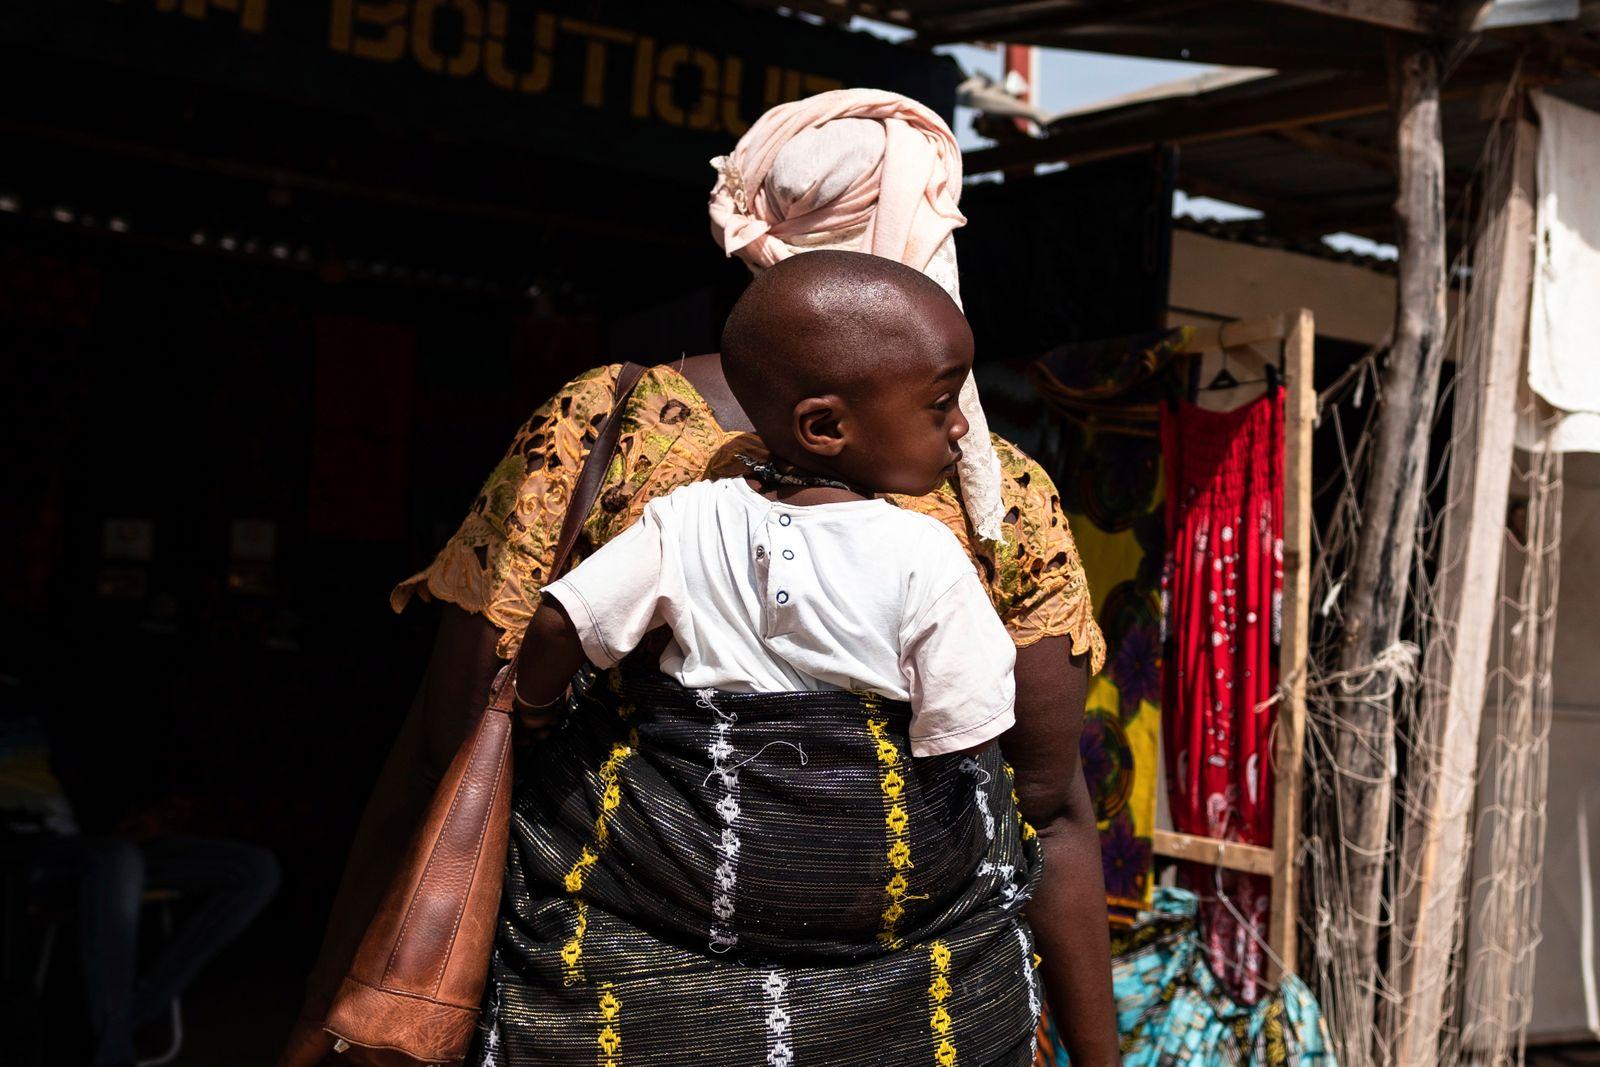 Daily Life In Dakar, Senegal